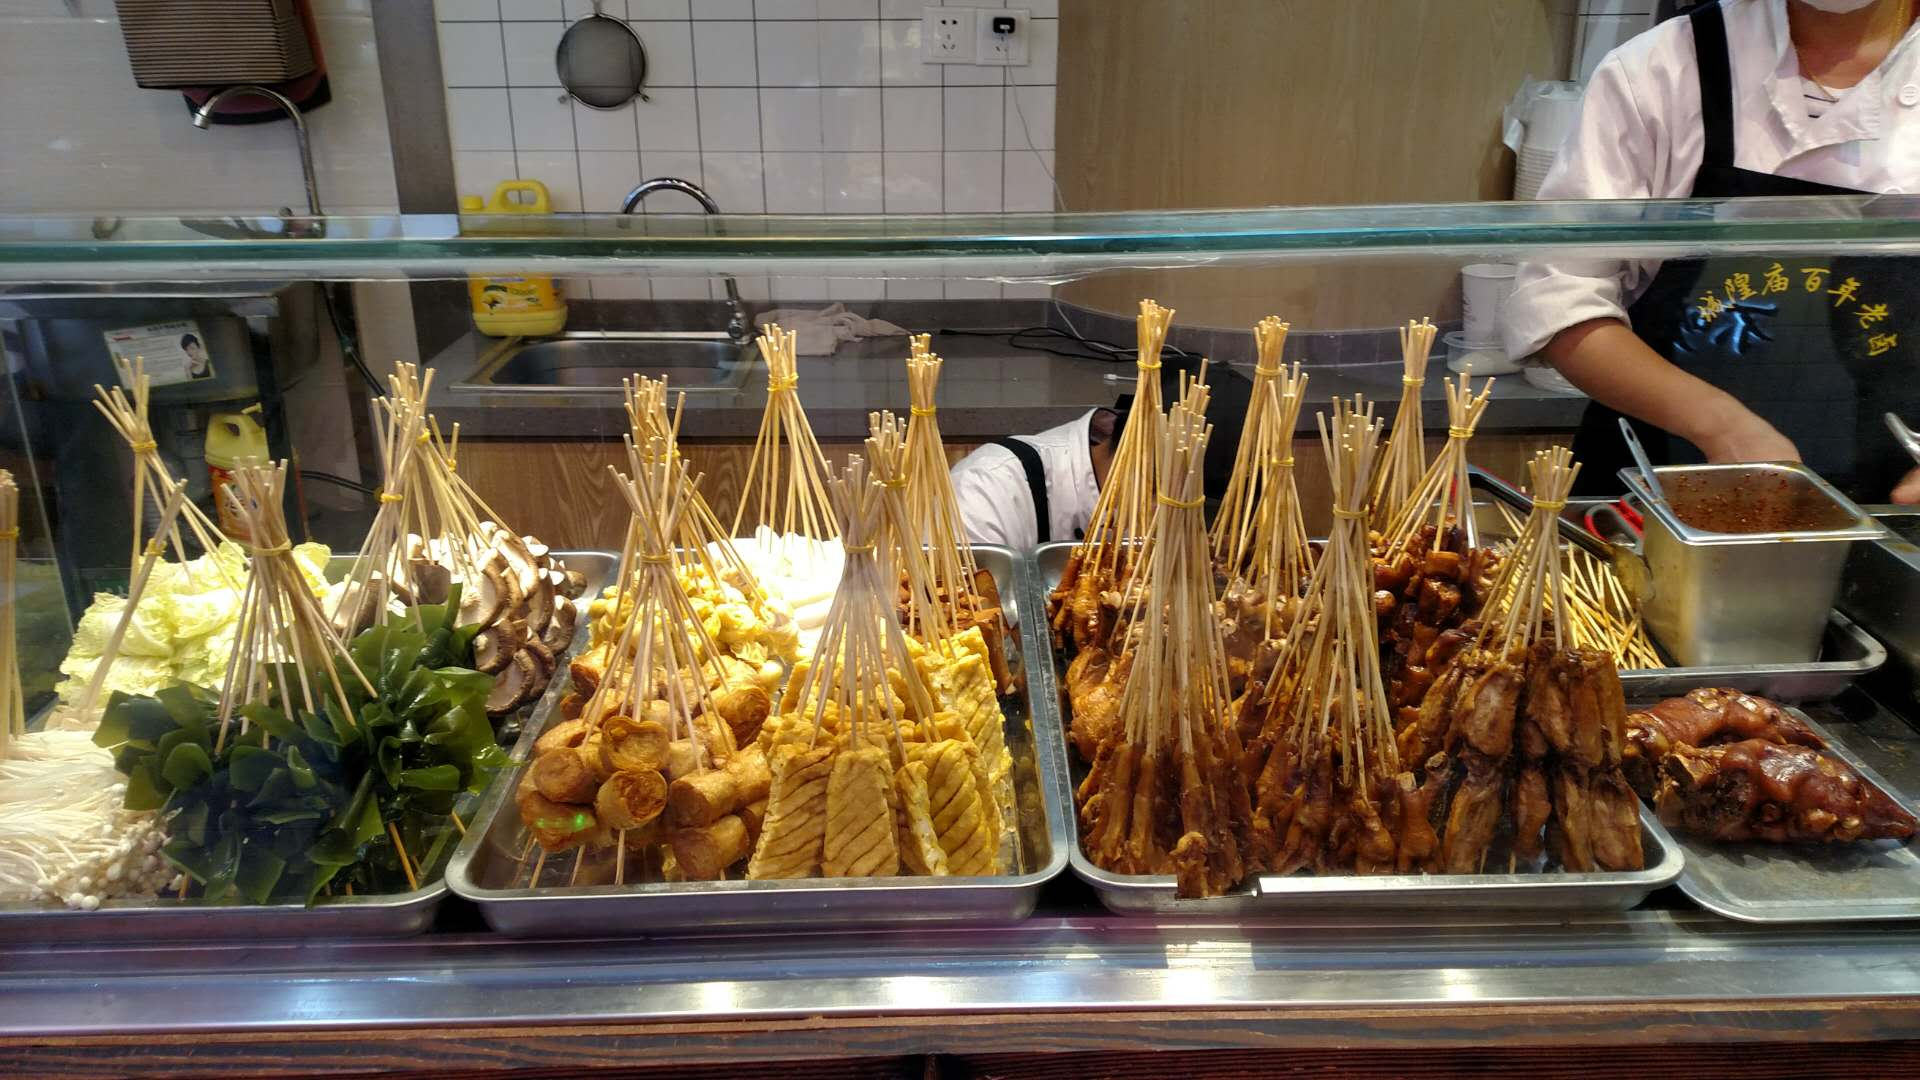 CAPAStudyAbroad_Shanghai_Summer2018_From Trisha Sanchez - Skewered Food